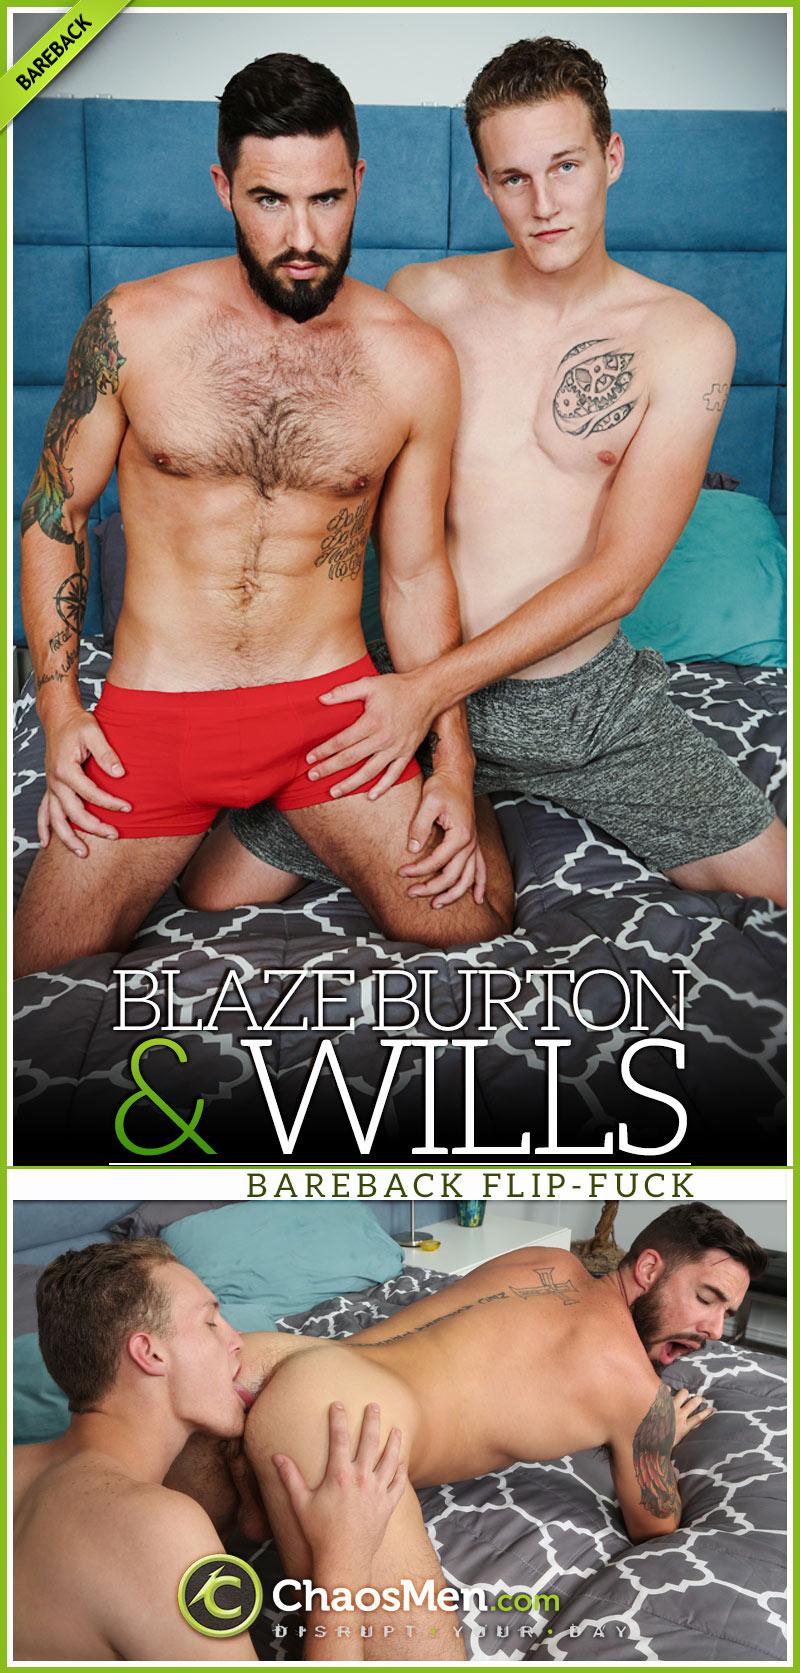 Blaze Burton and Wills (Bareback Flip-Fuck)